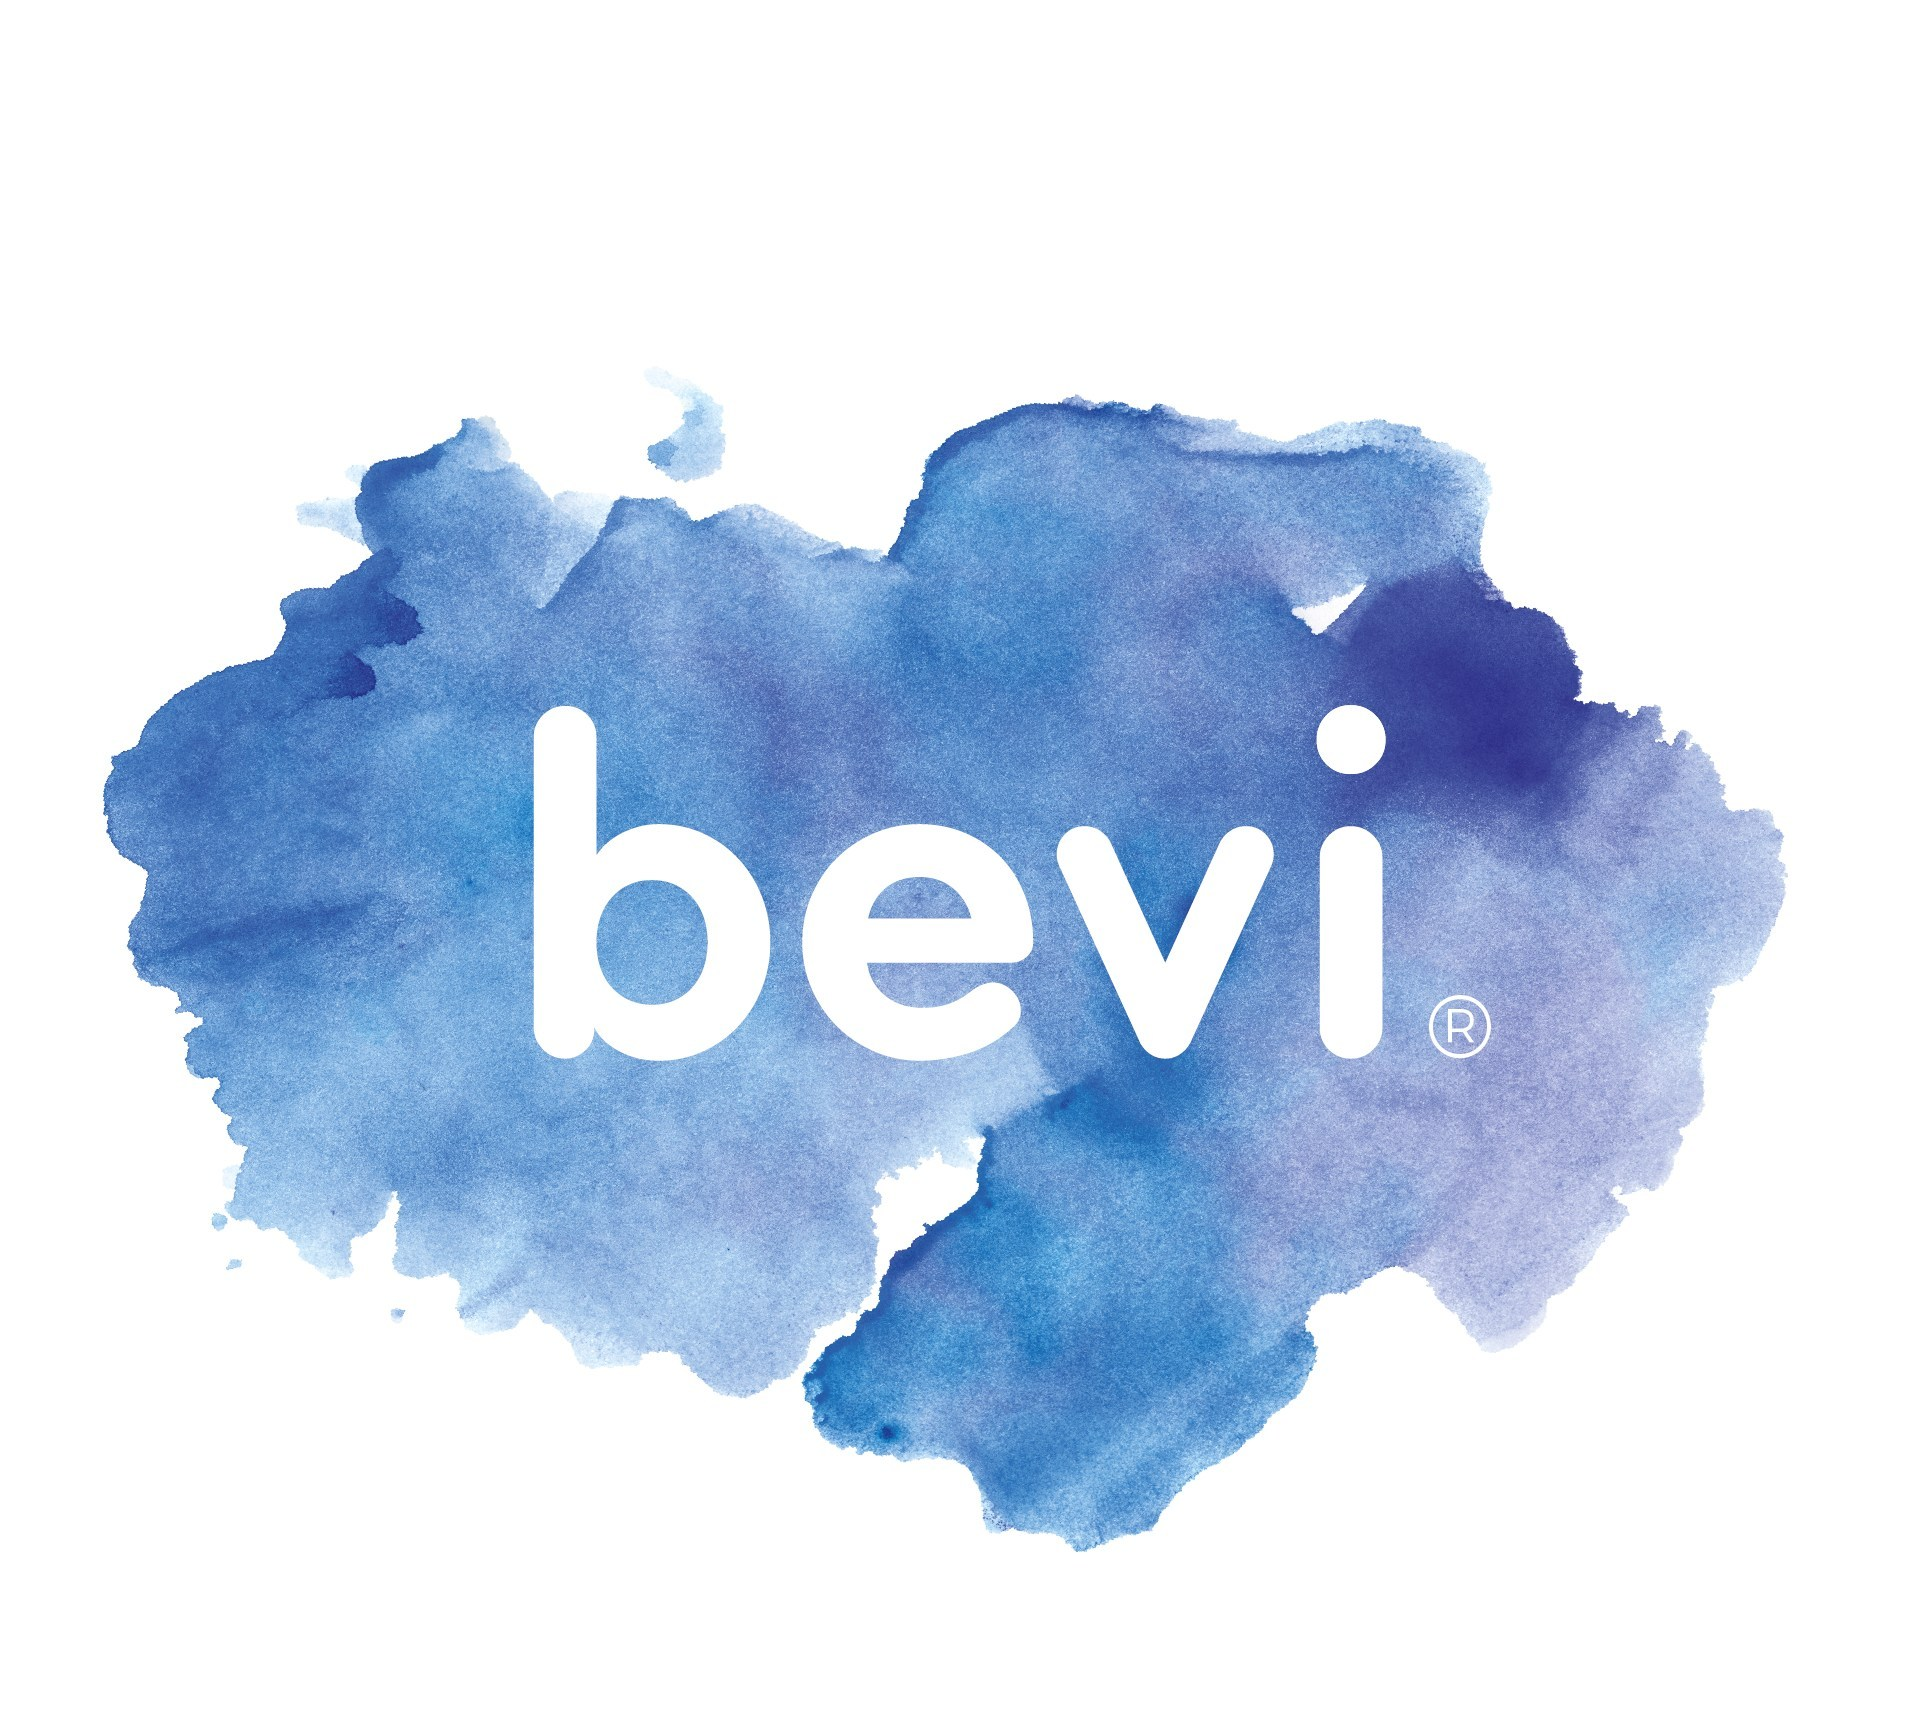 Smart Beverage Platform Bevi Raises $16.5M